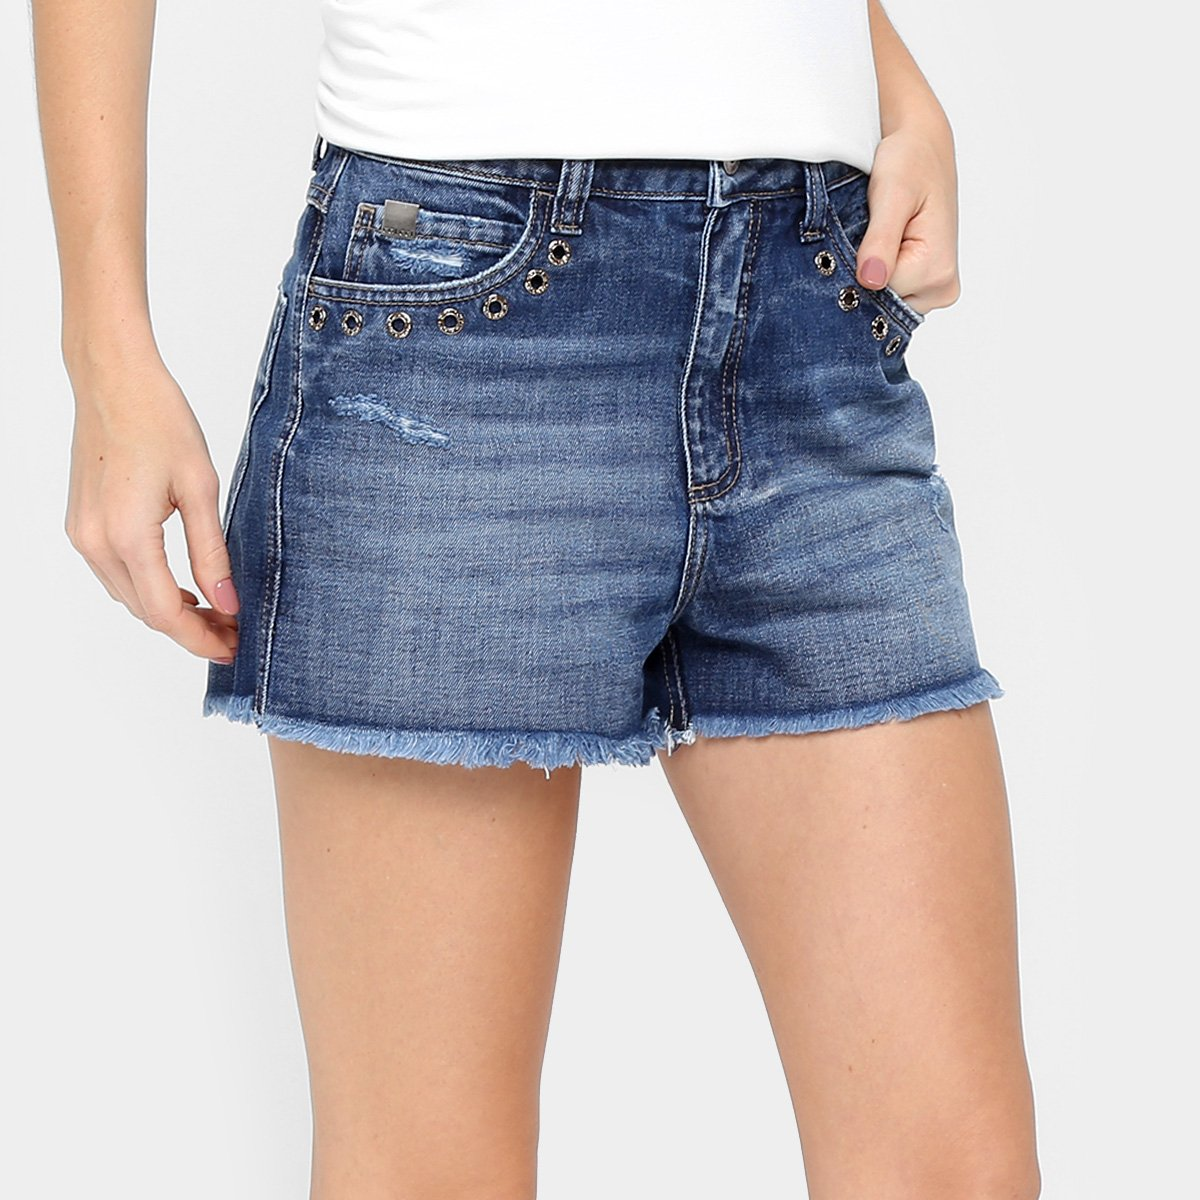 309dbe040 Shorts Colcci - Ótimos Preços | Zattini